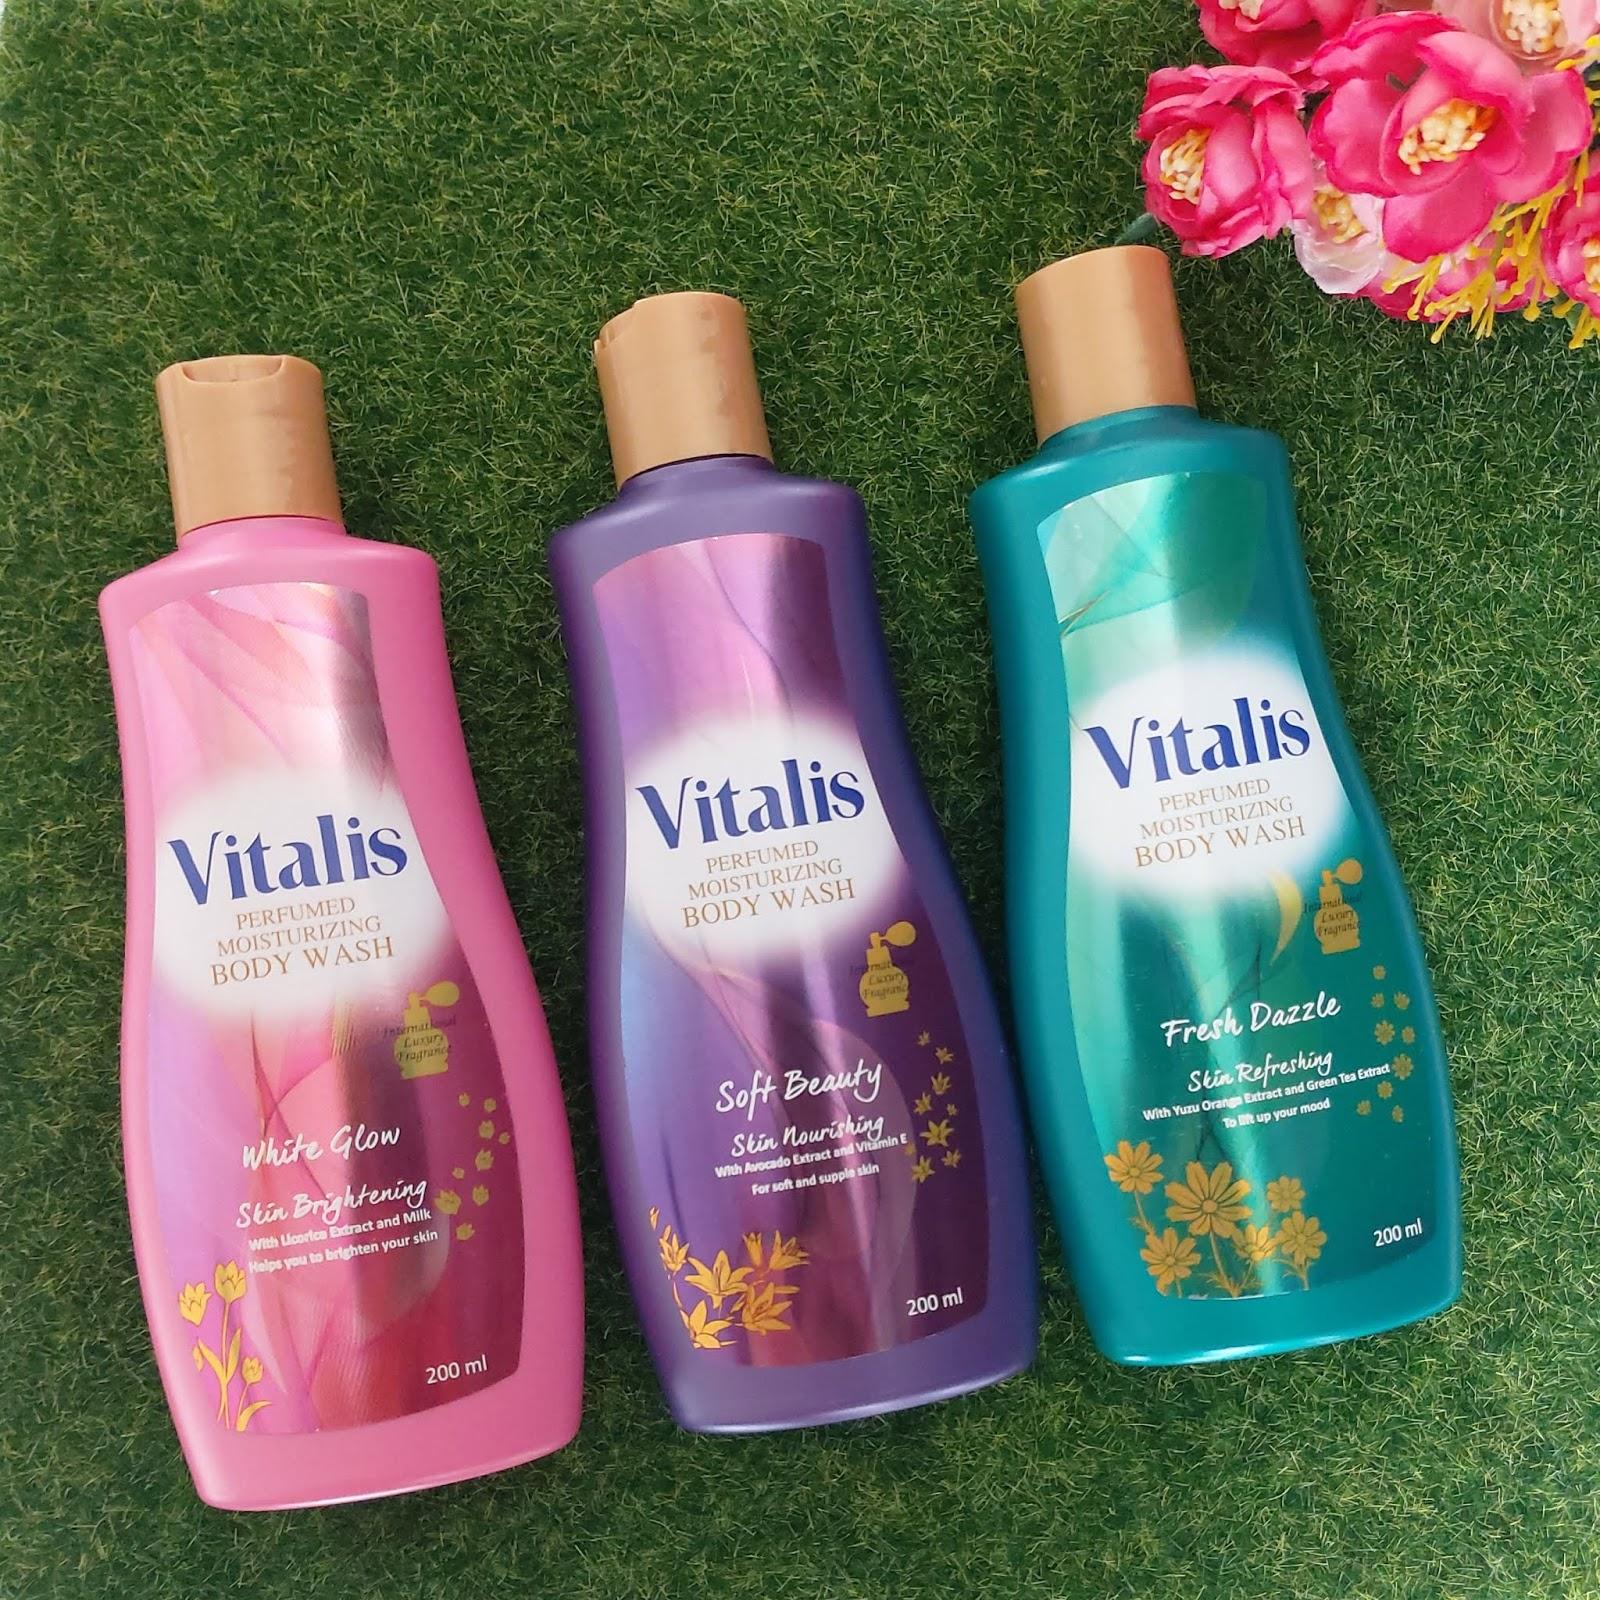 vitalis-perfumed-moisturizing-body-wash